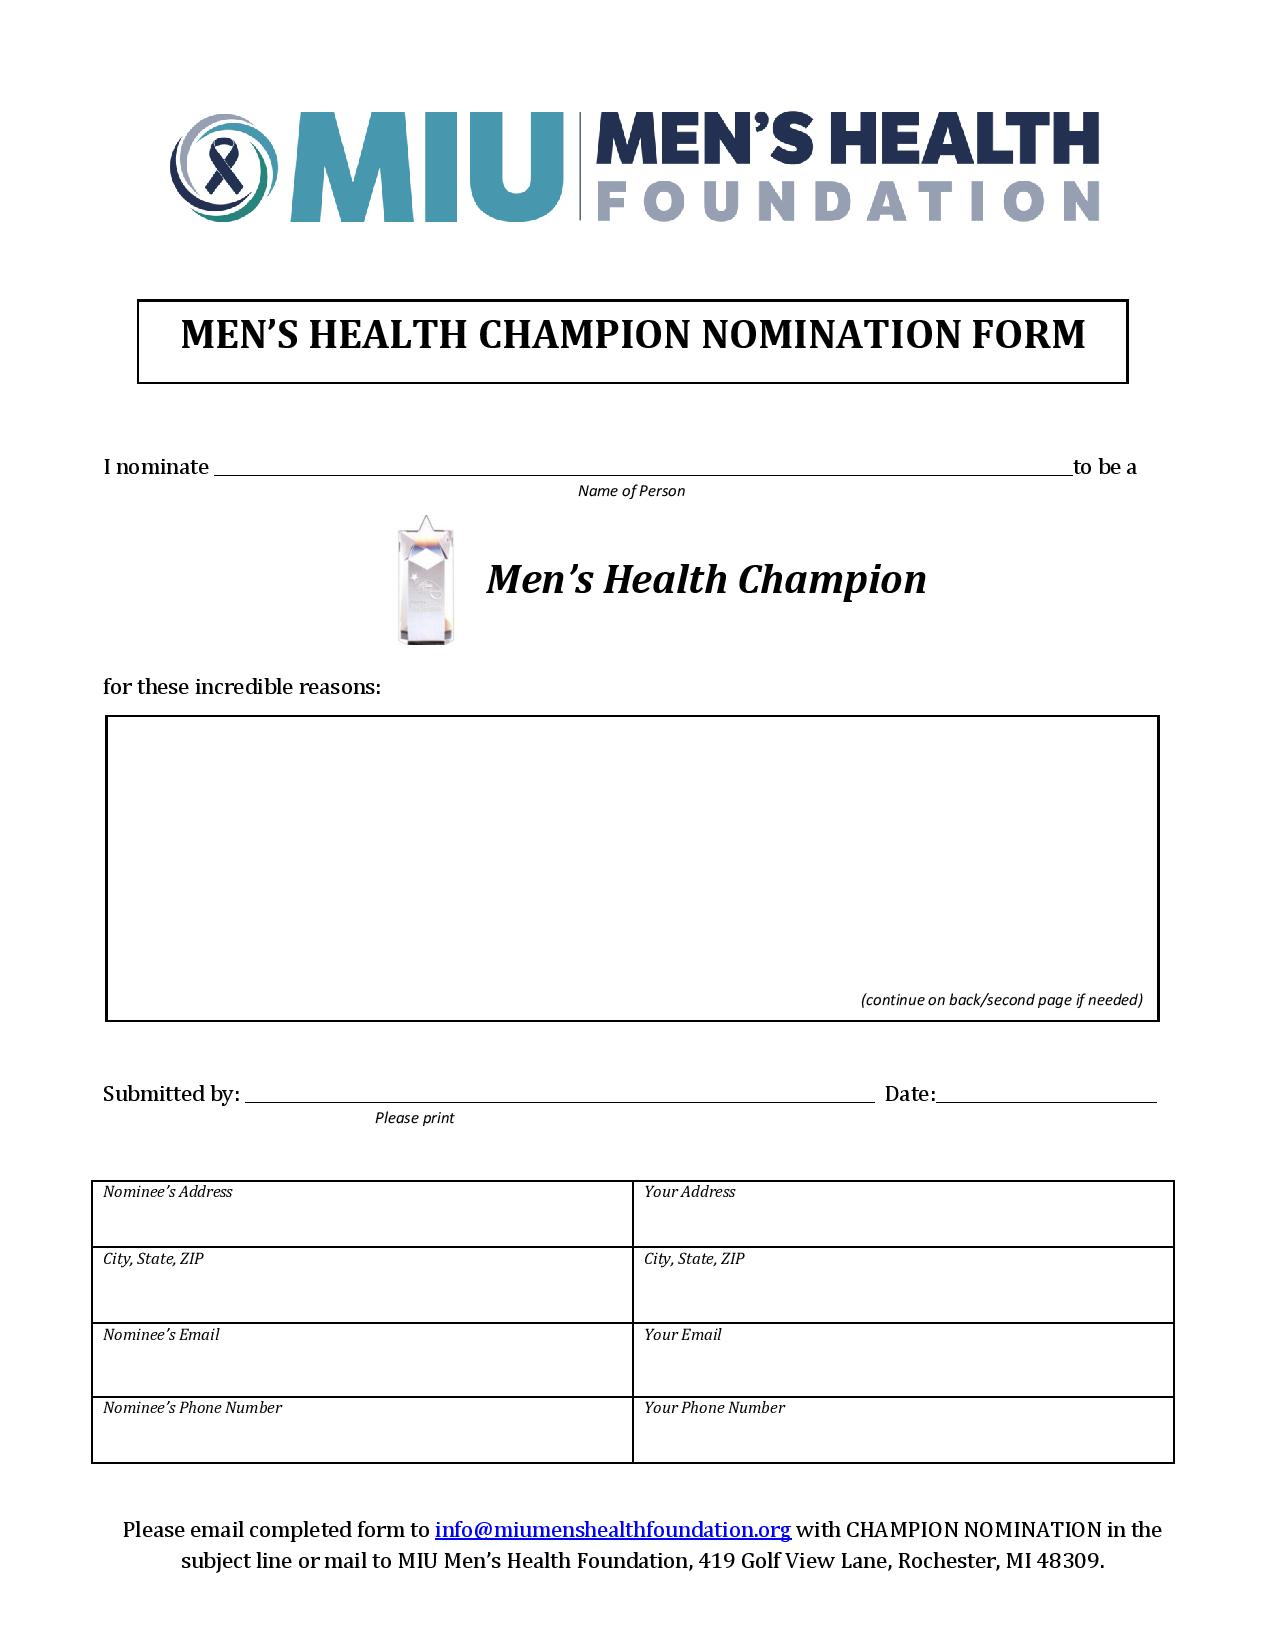 Men s Health Champion Nomination Form.jpg